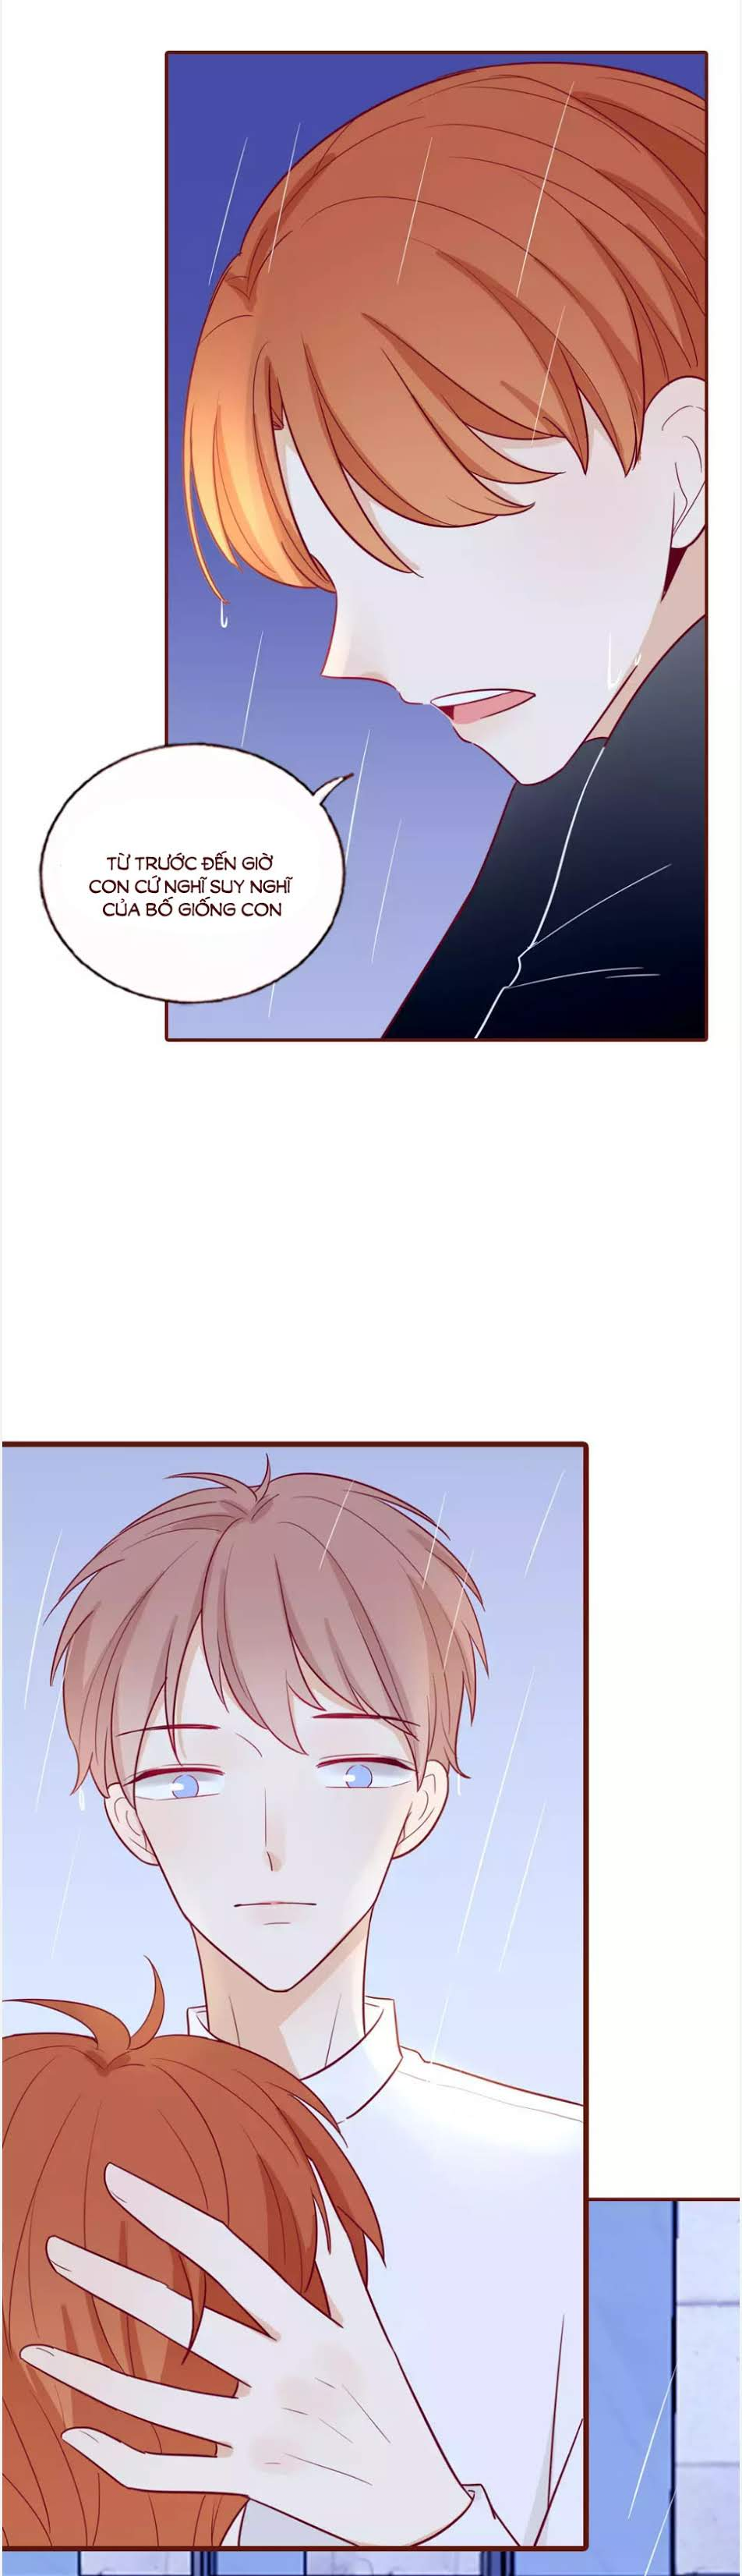 Trái Tim Bí Ẩn Chapter 96 - Truyenmoi.xyz